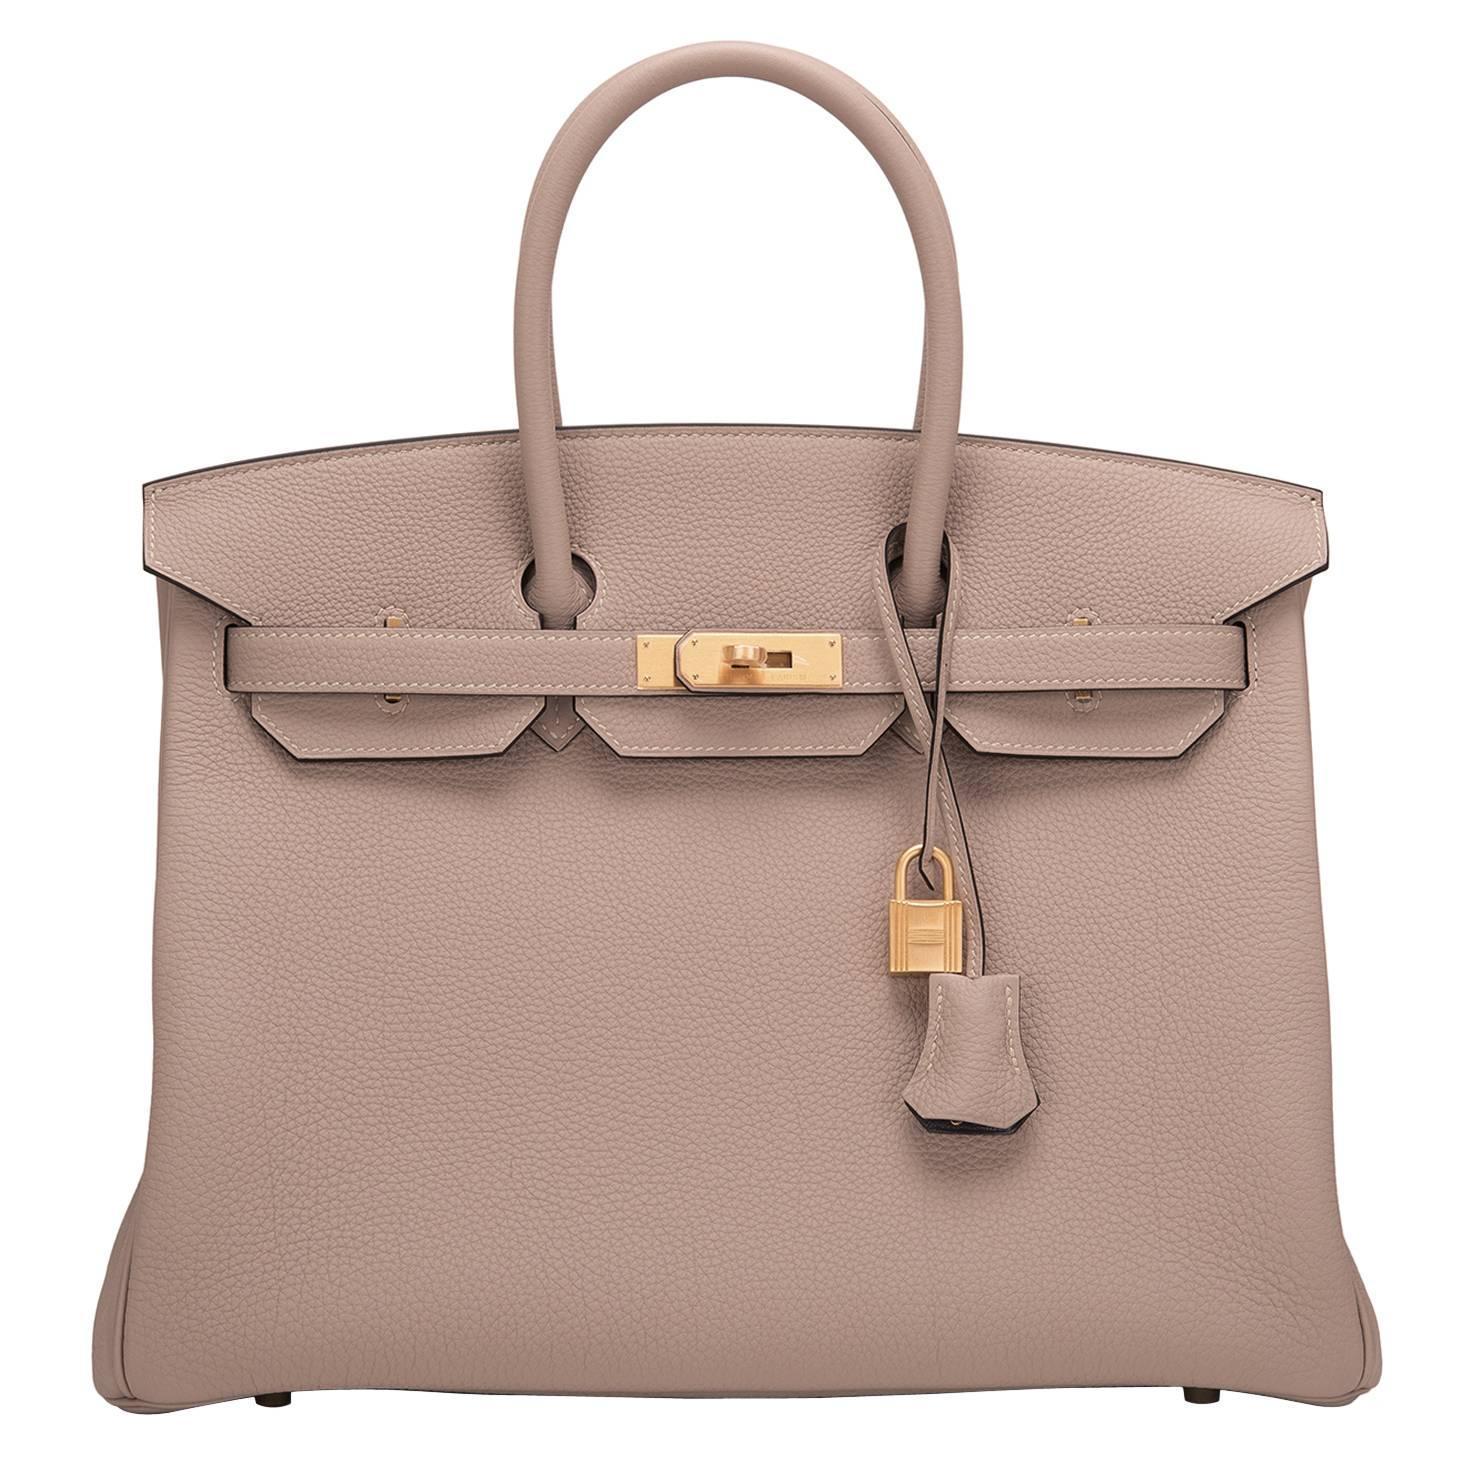 herme handbags - hermes macassar togo birkin 30cm gold hardware, best place to buy ...